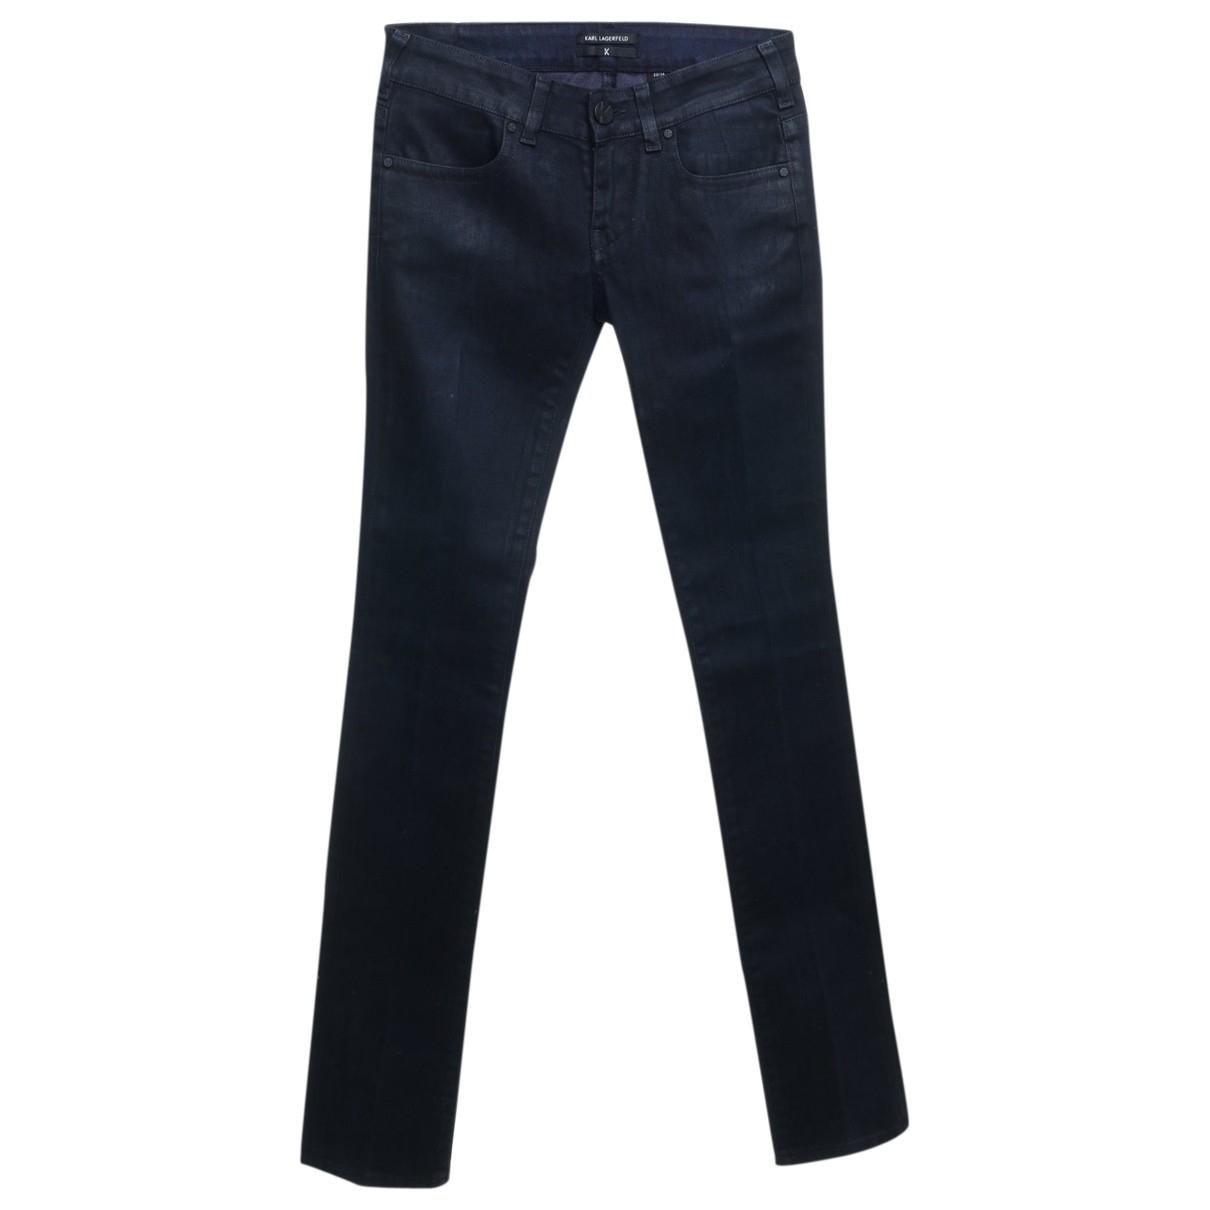 Karl Lagerfeld \N Blue Cotton - elasthane Jeans for Women 29 US